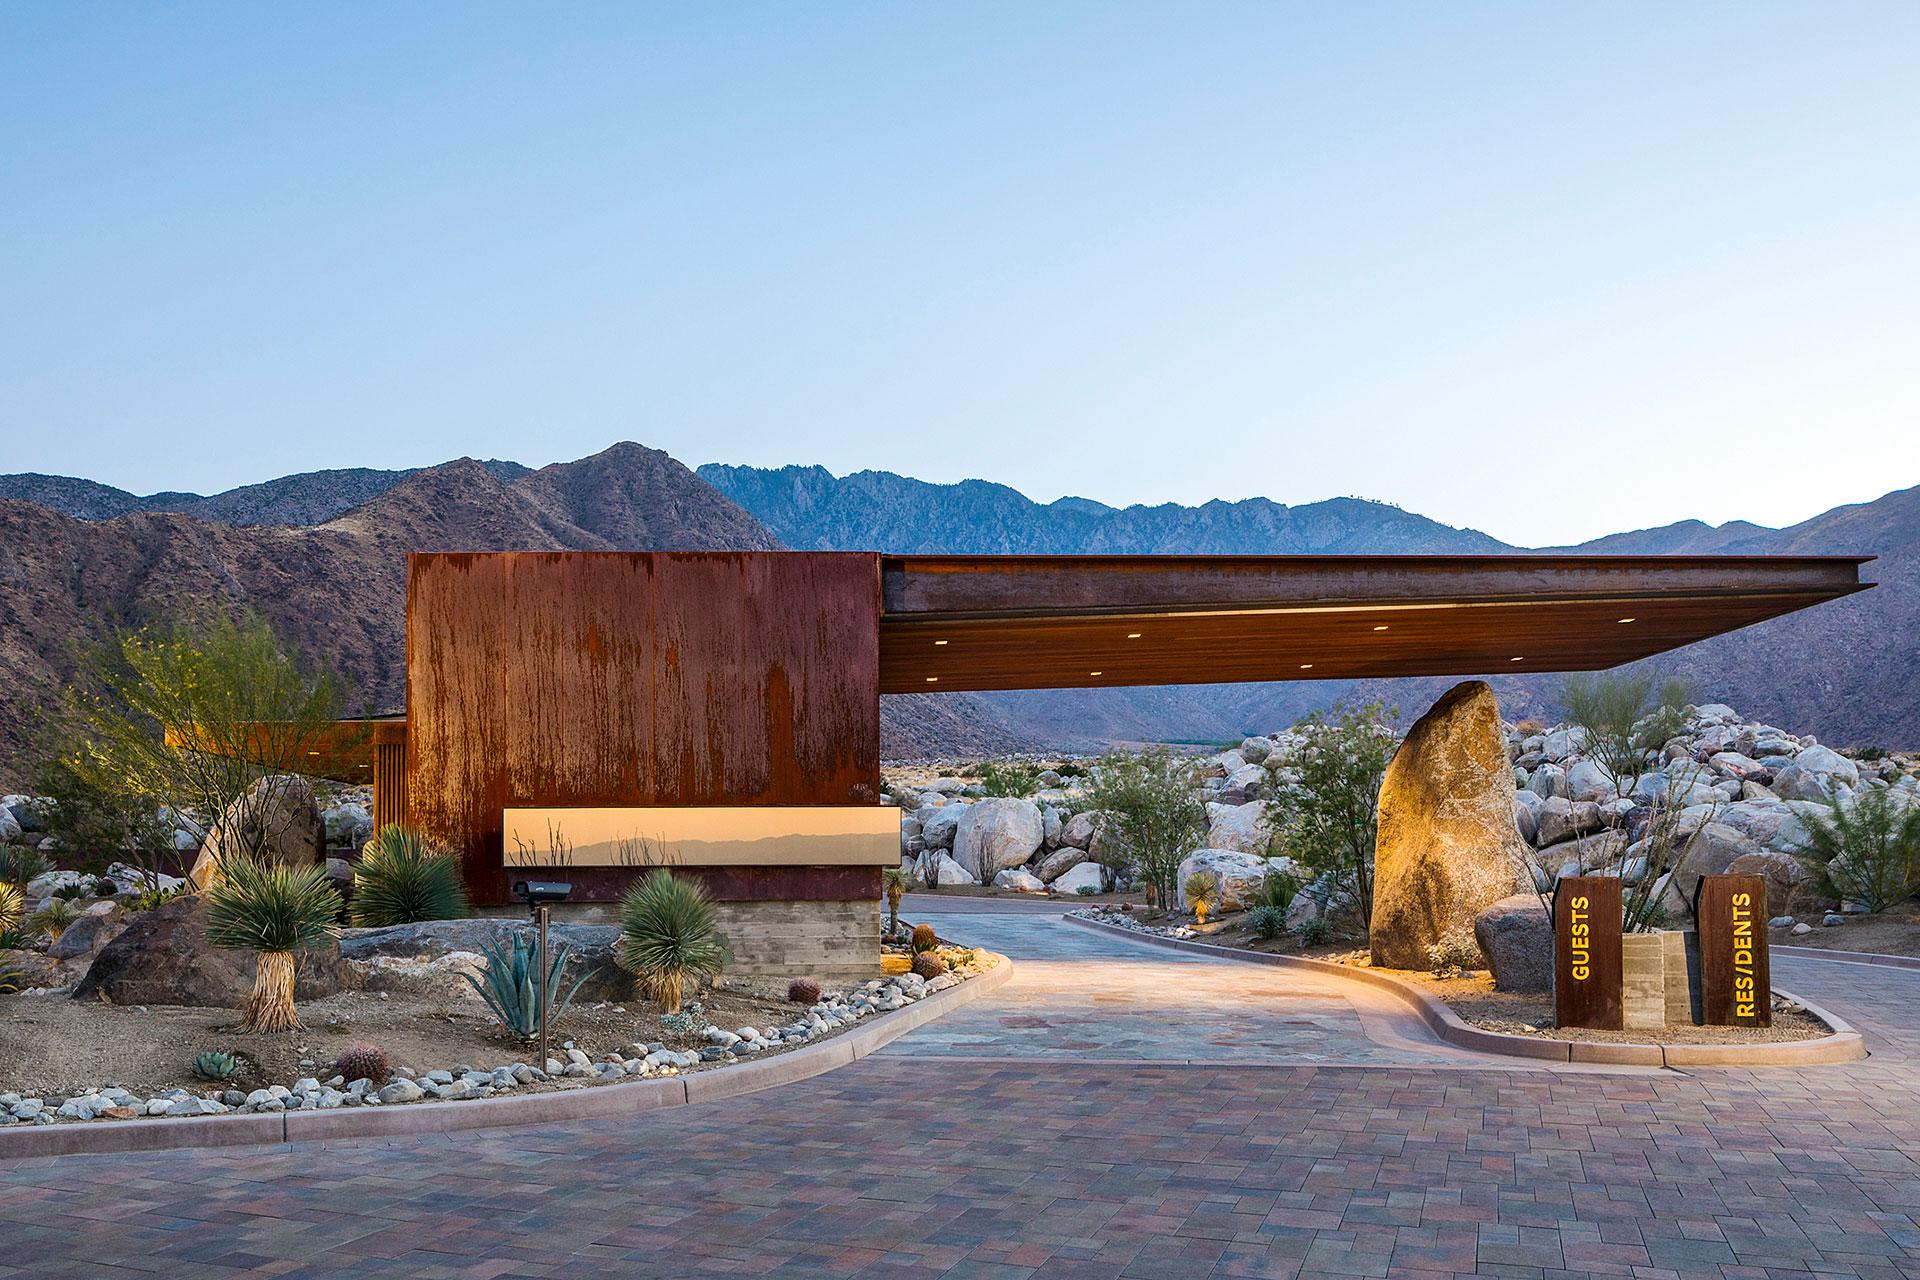 Desert Palisades Guardhouse